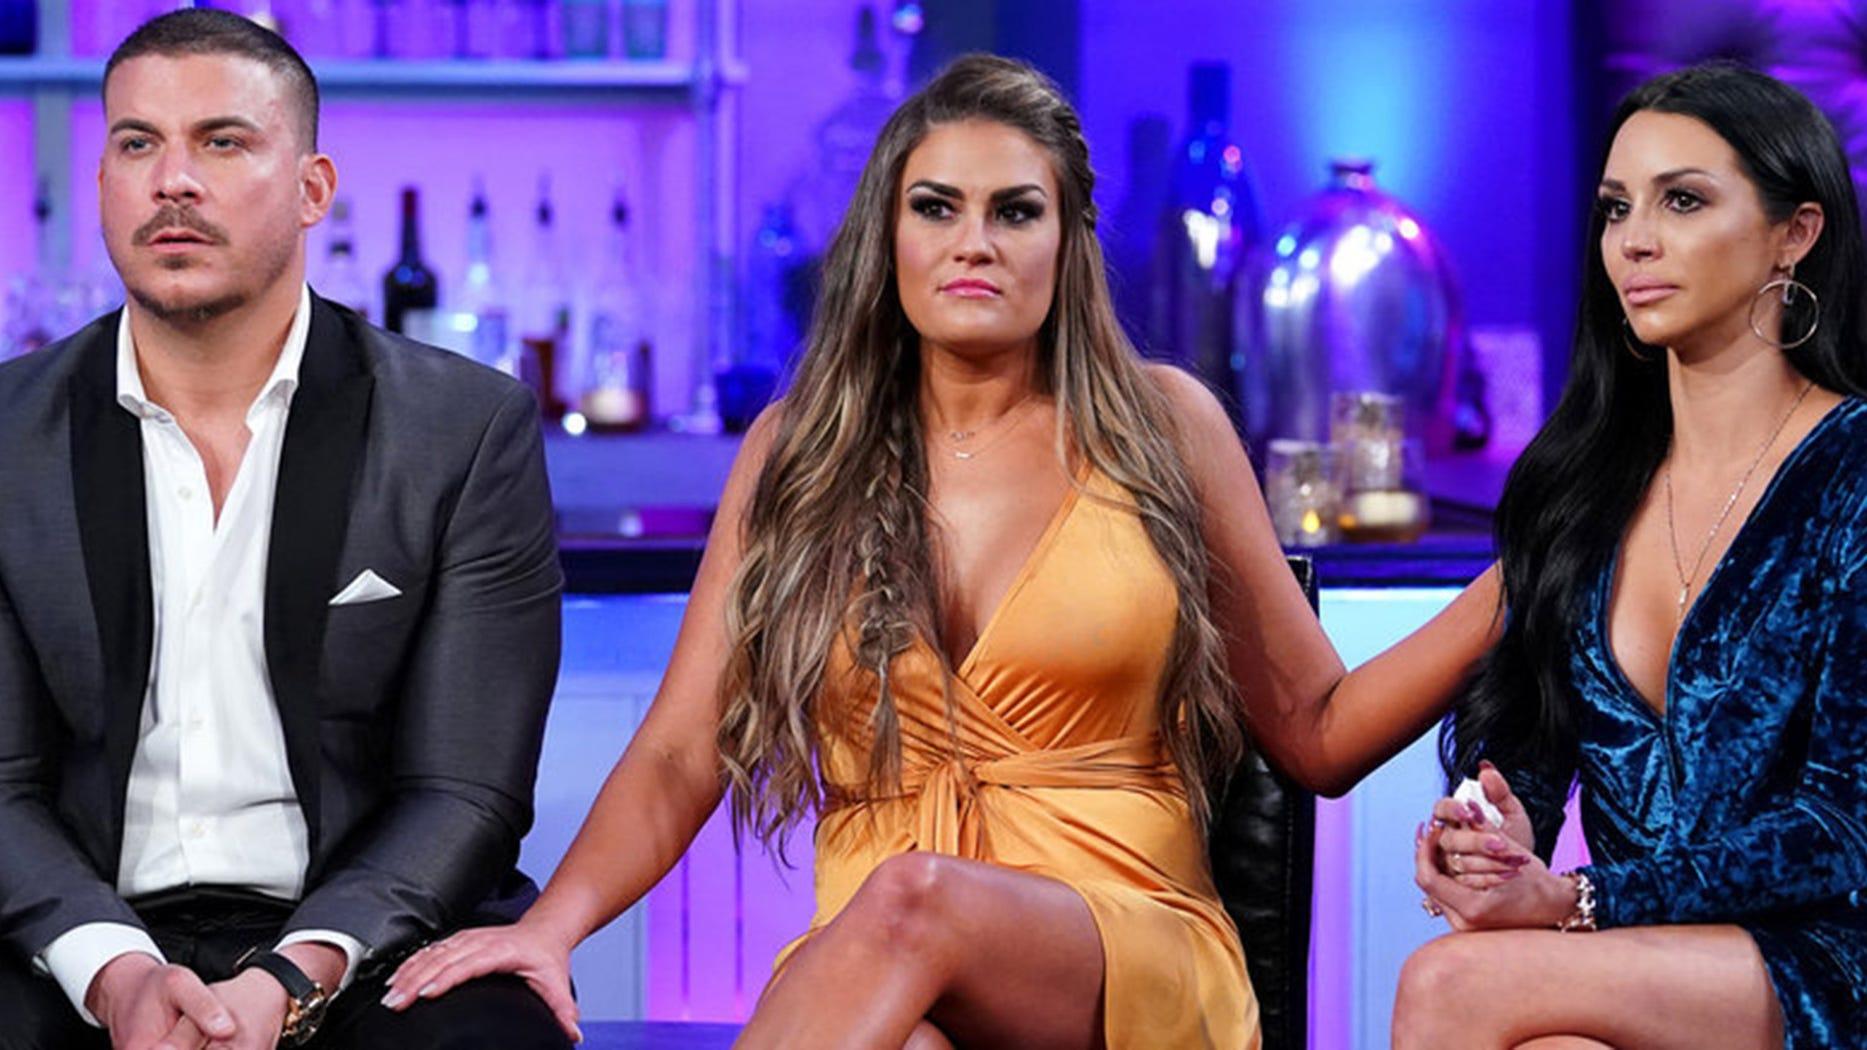 Jax Taylor, Brittany Cartwright and Scheana Marie, Vanderpump Rules